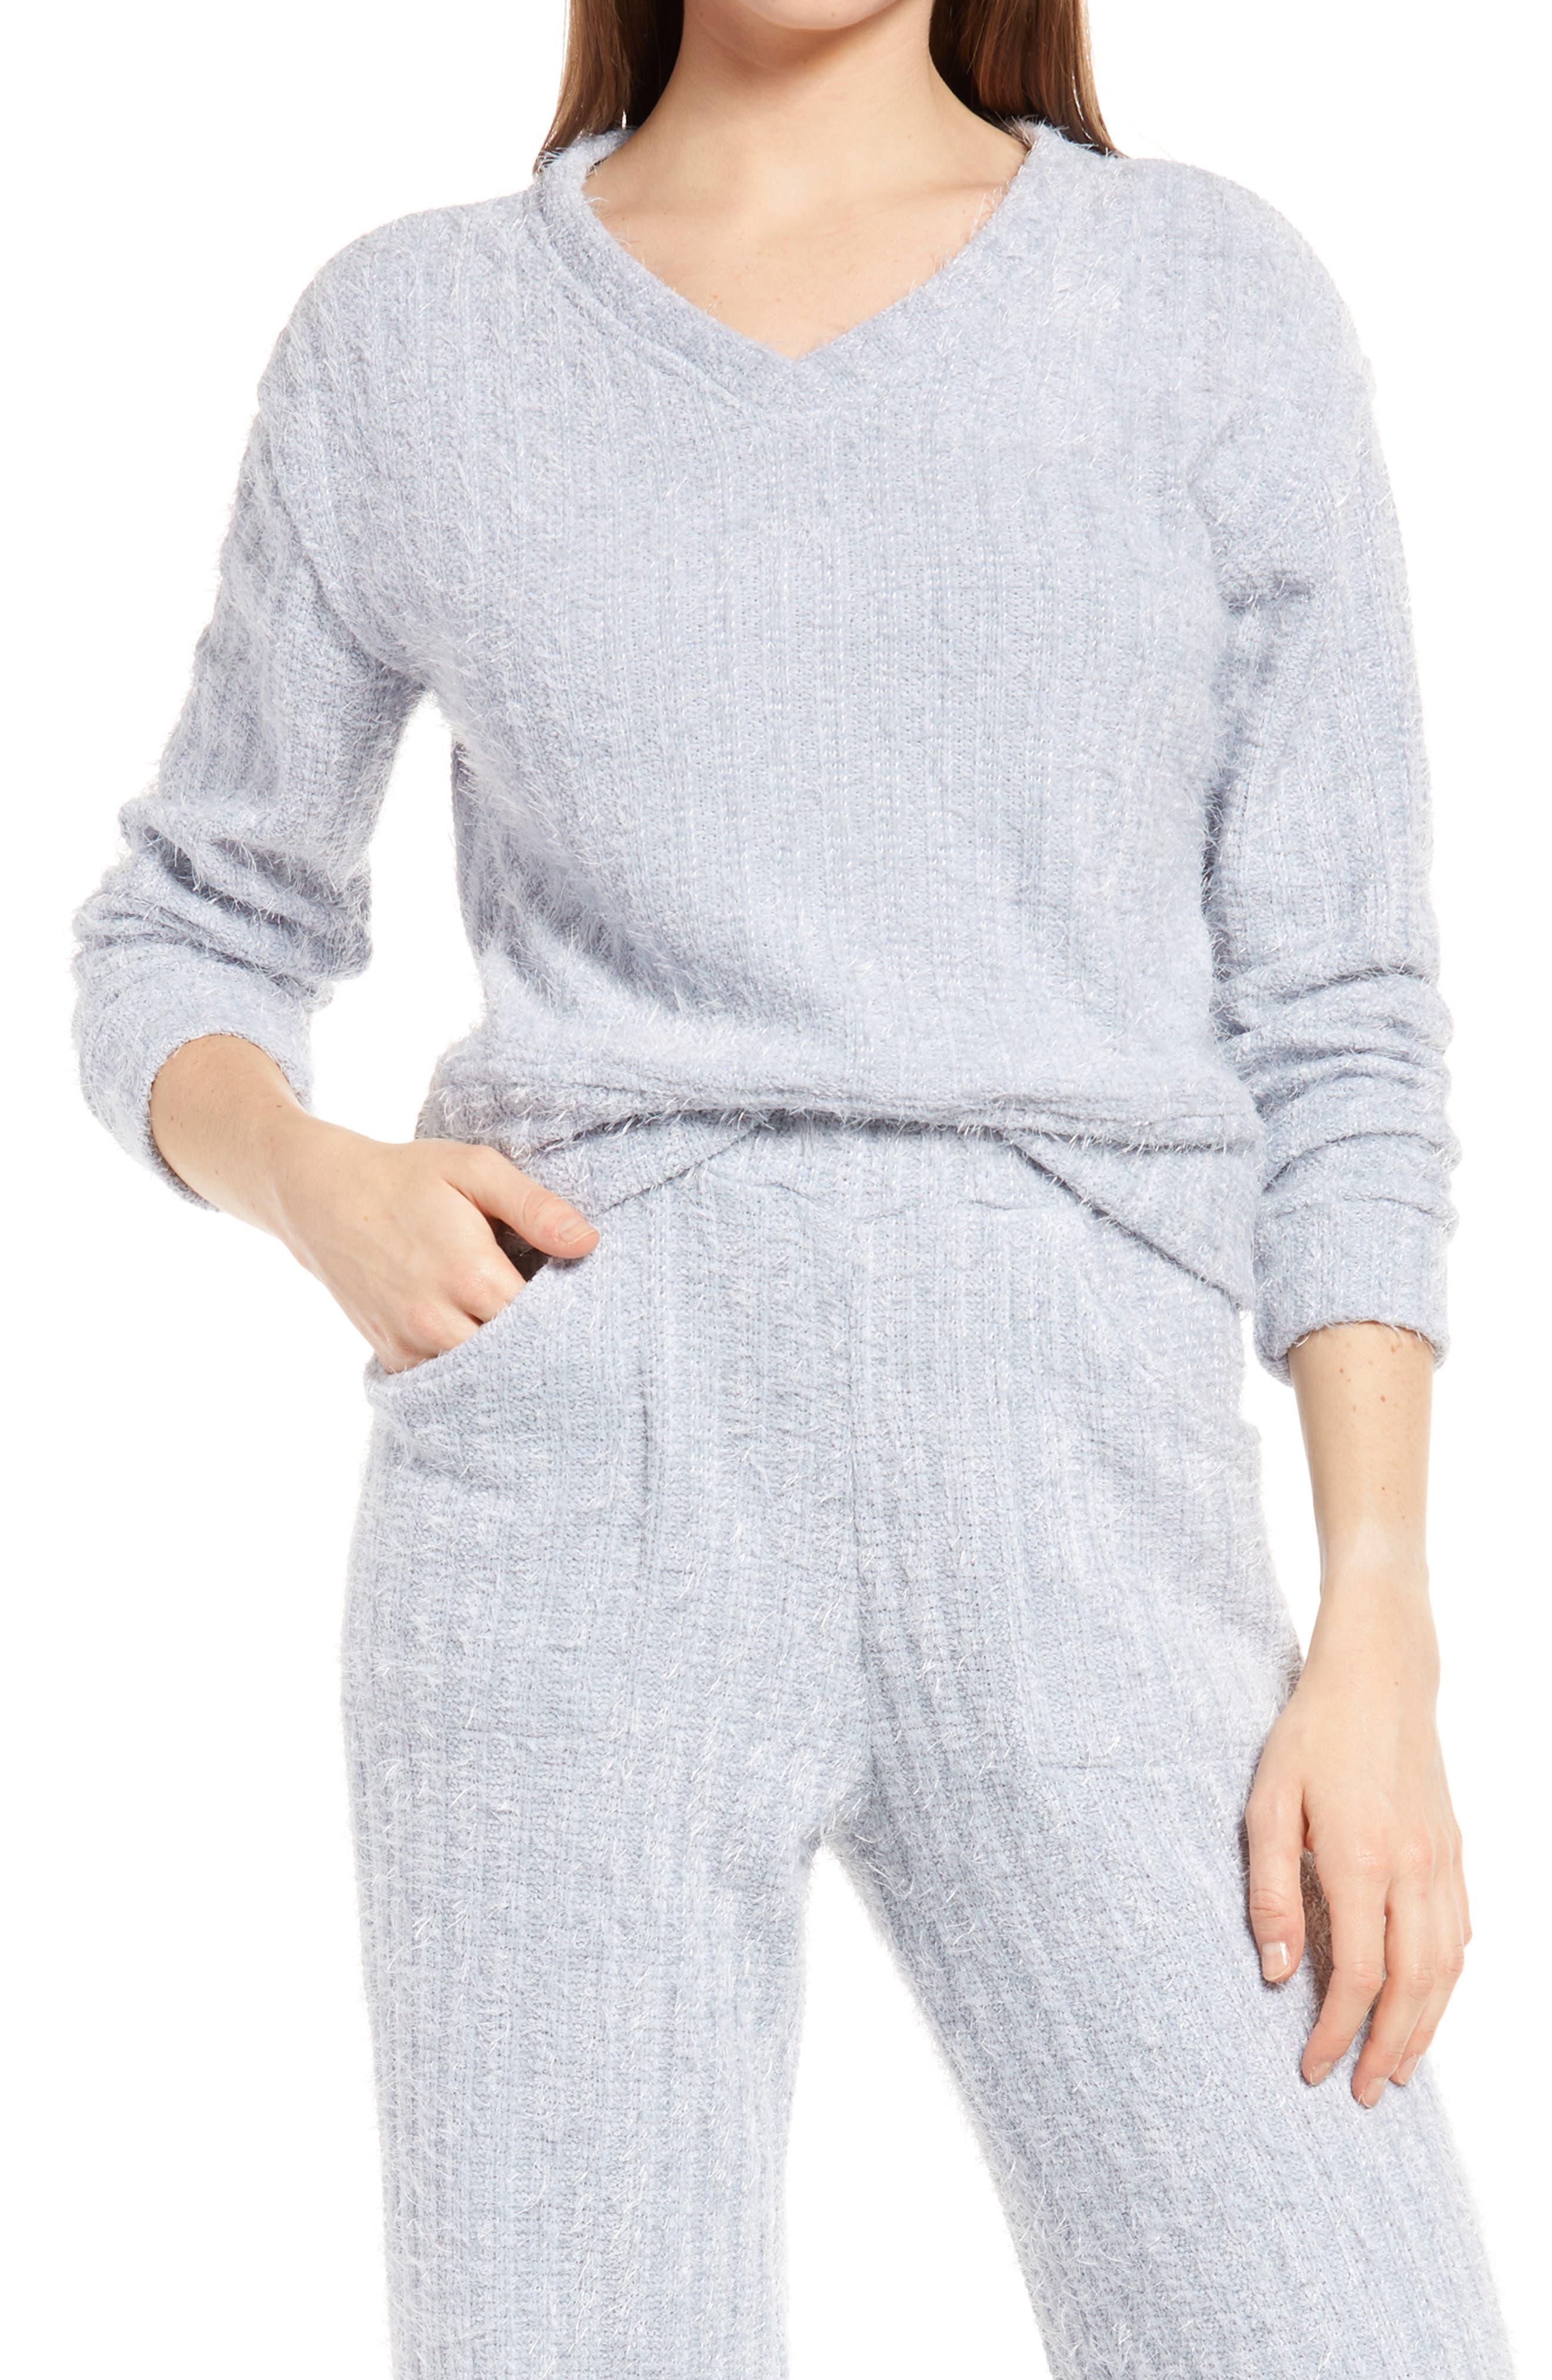 Women's Kendall + Kylie V-Neck Eyelash Sweater